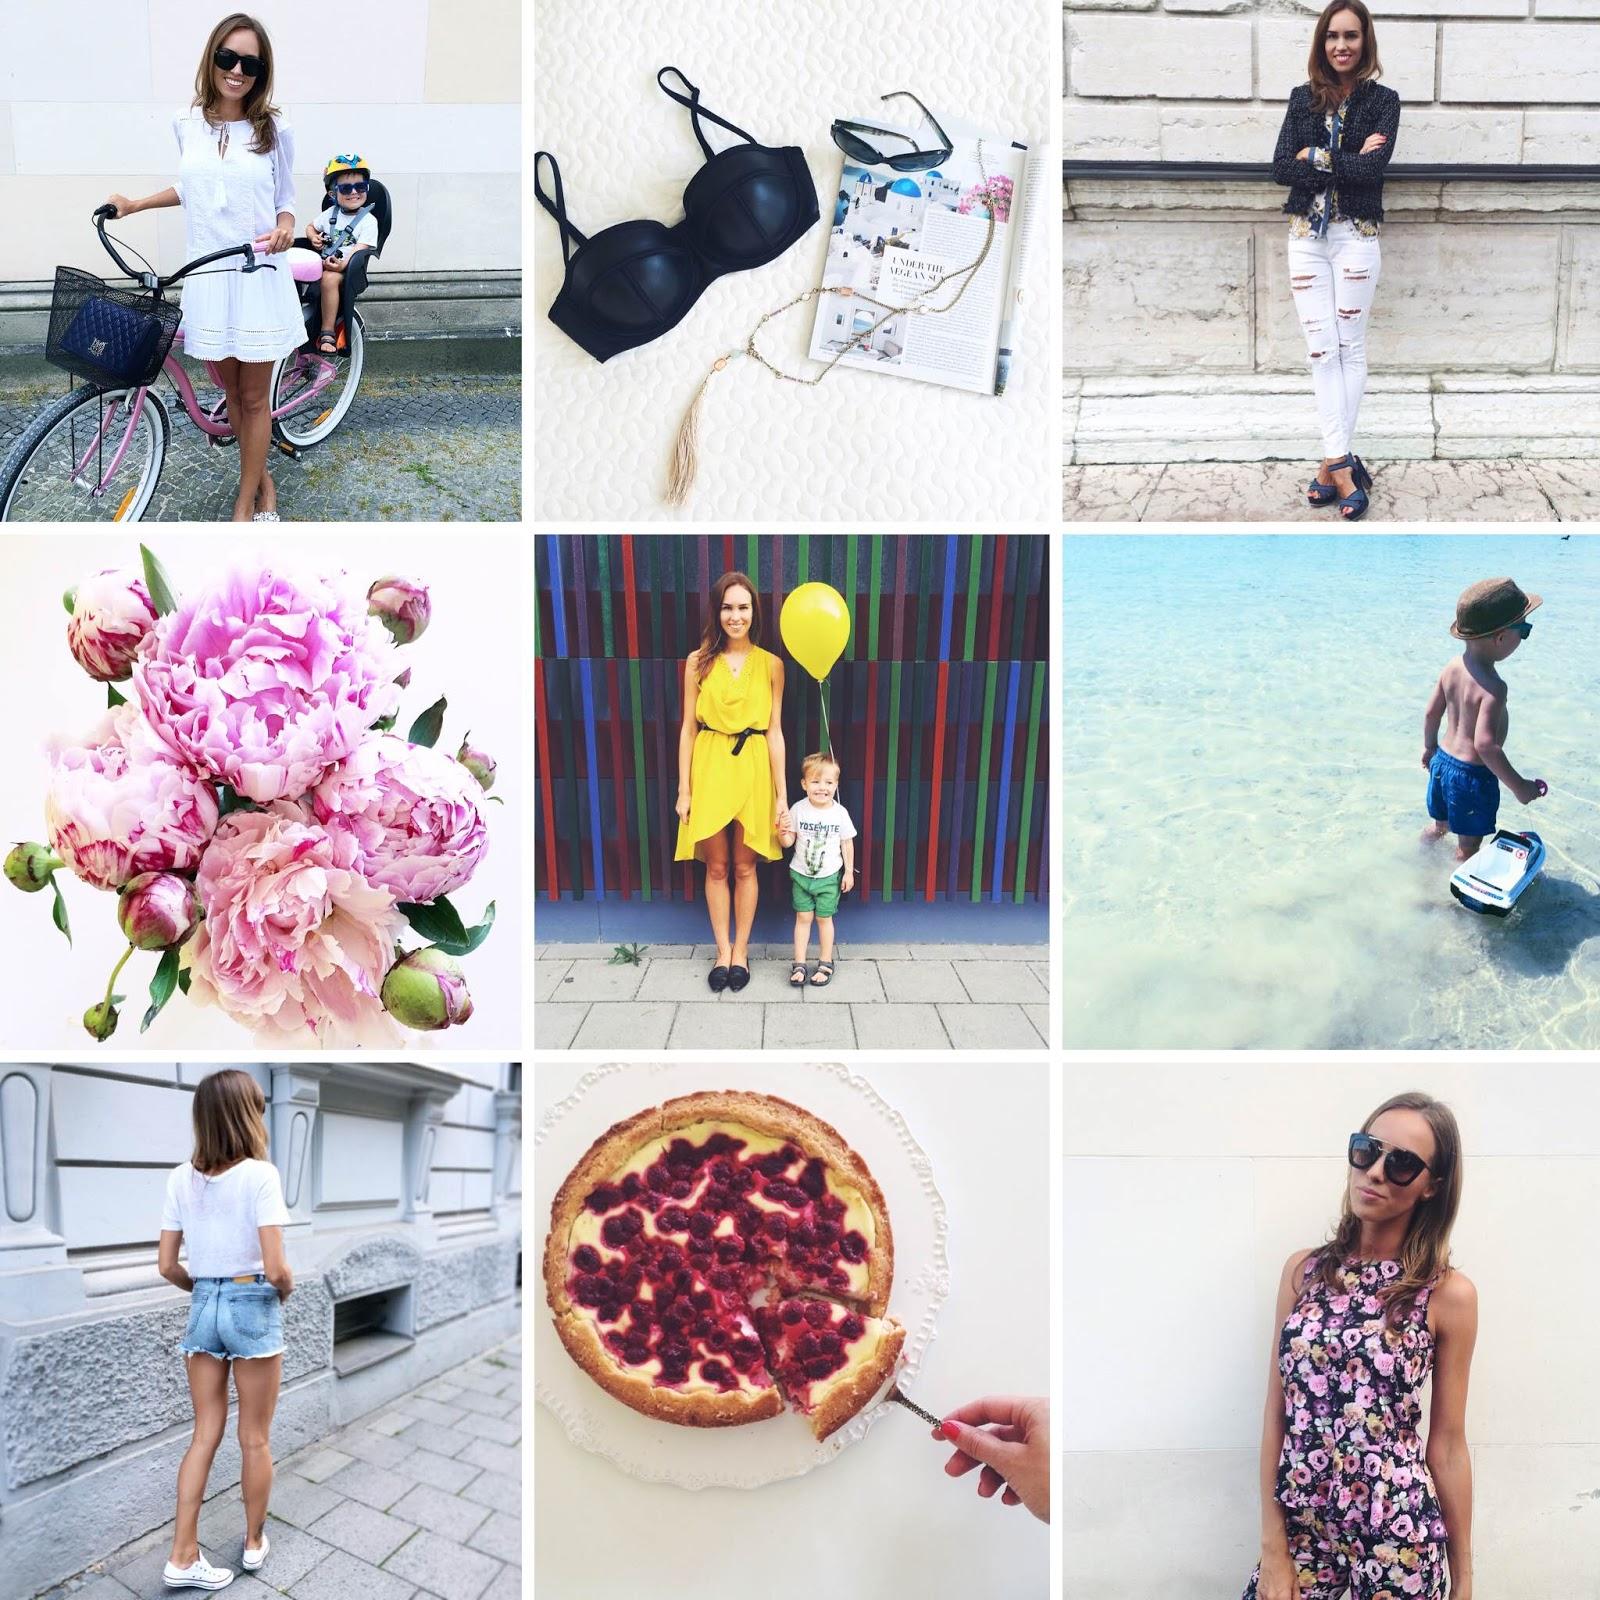 kristjaana mere instagram eesti blogija moe blogi laste blogi